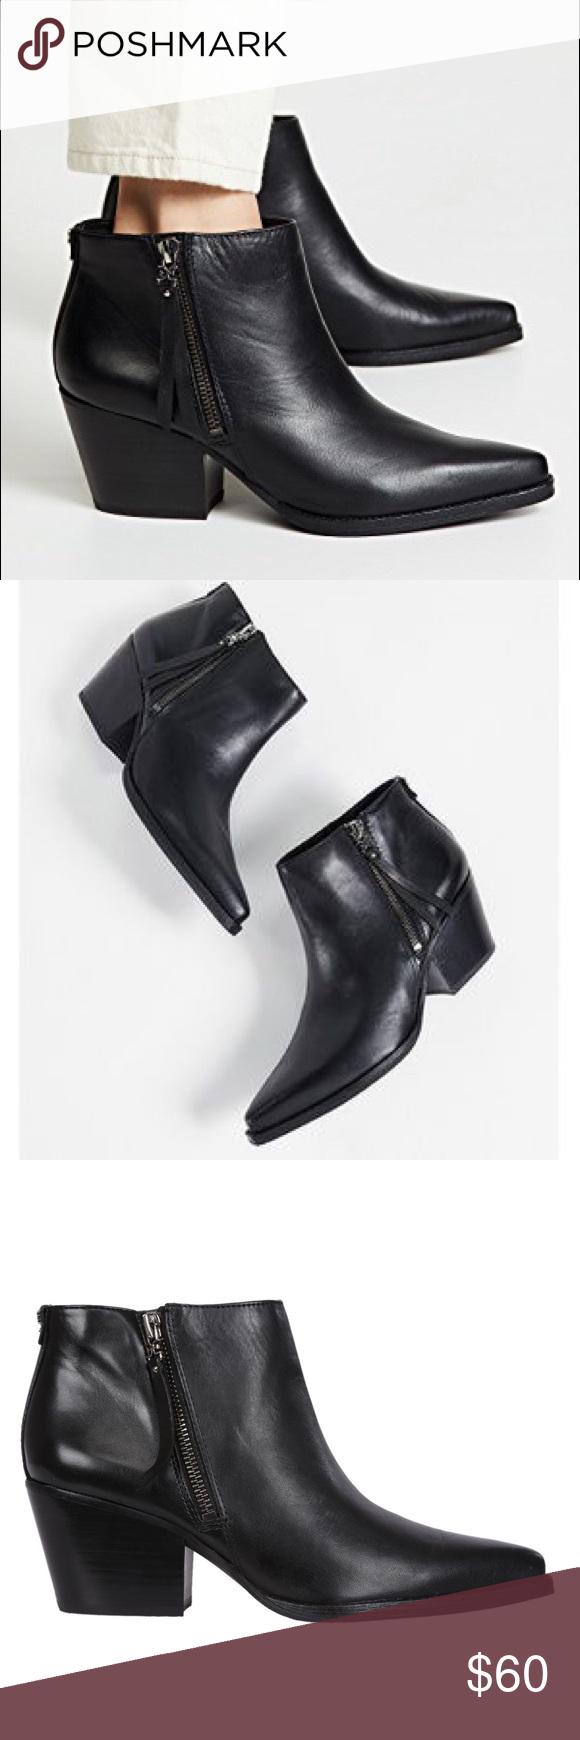 45382468646d SAM EDELMAN Walden bootie Worn once. 8.5. Low block western heel. Zip up  side. Black leather. Sam Edelman Shoes Ankle Boots   Booties